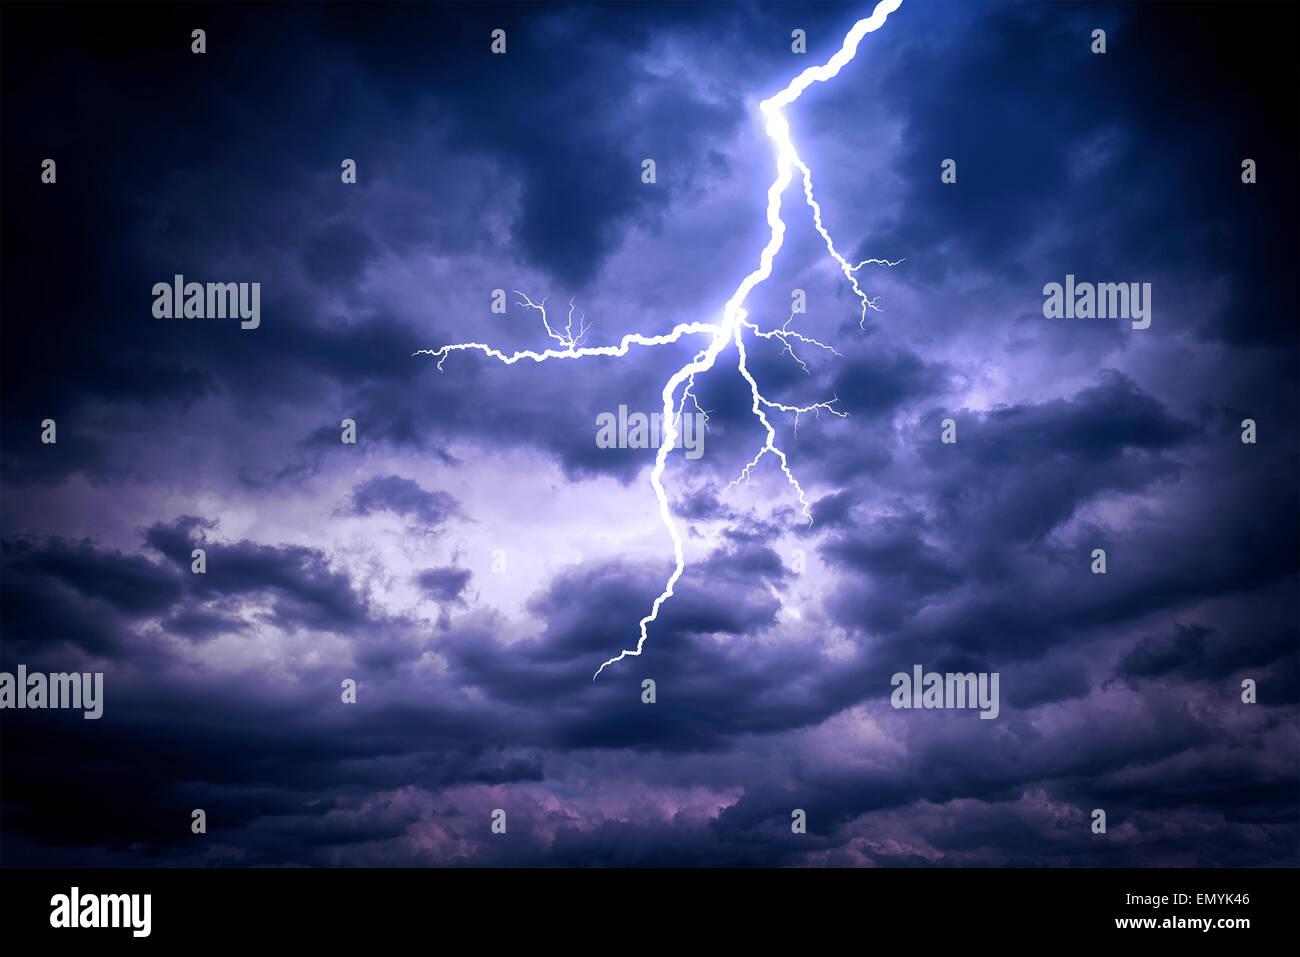 Lightning strike - Stock Image